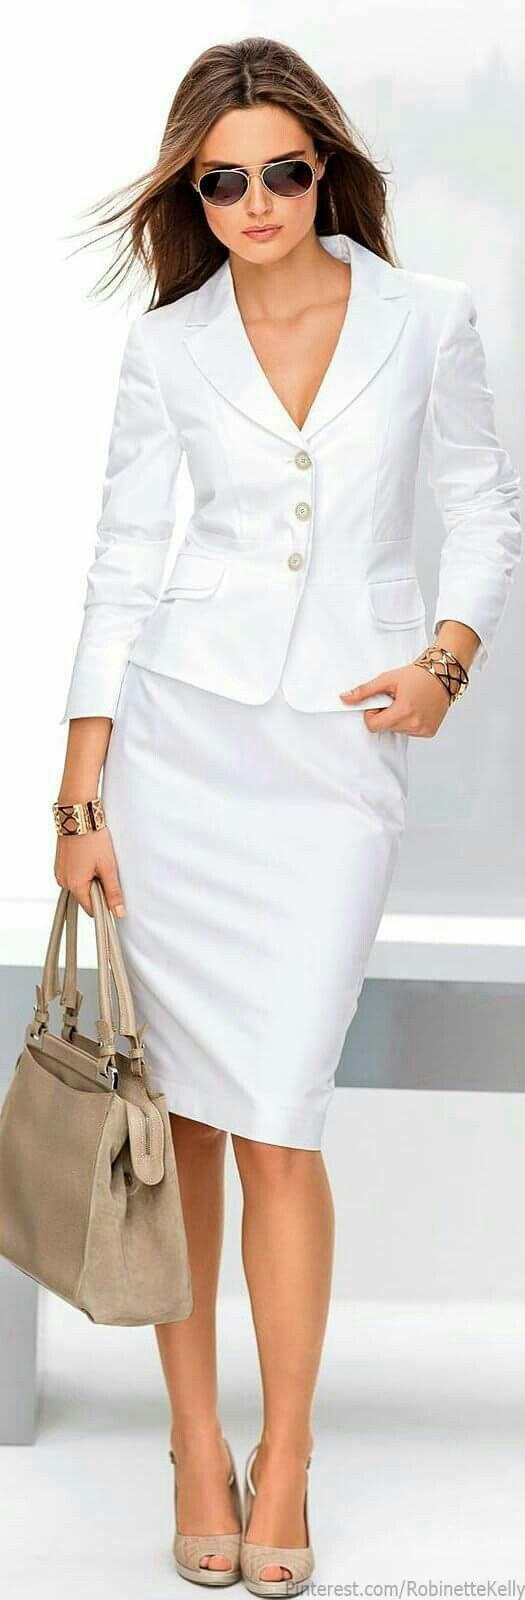 Tailleur - branco